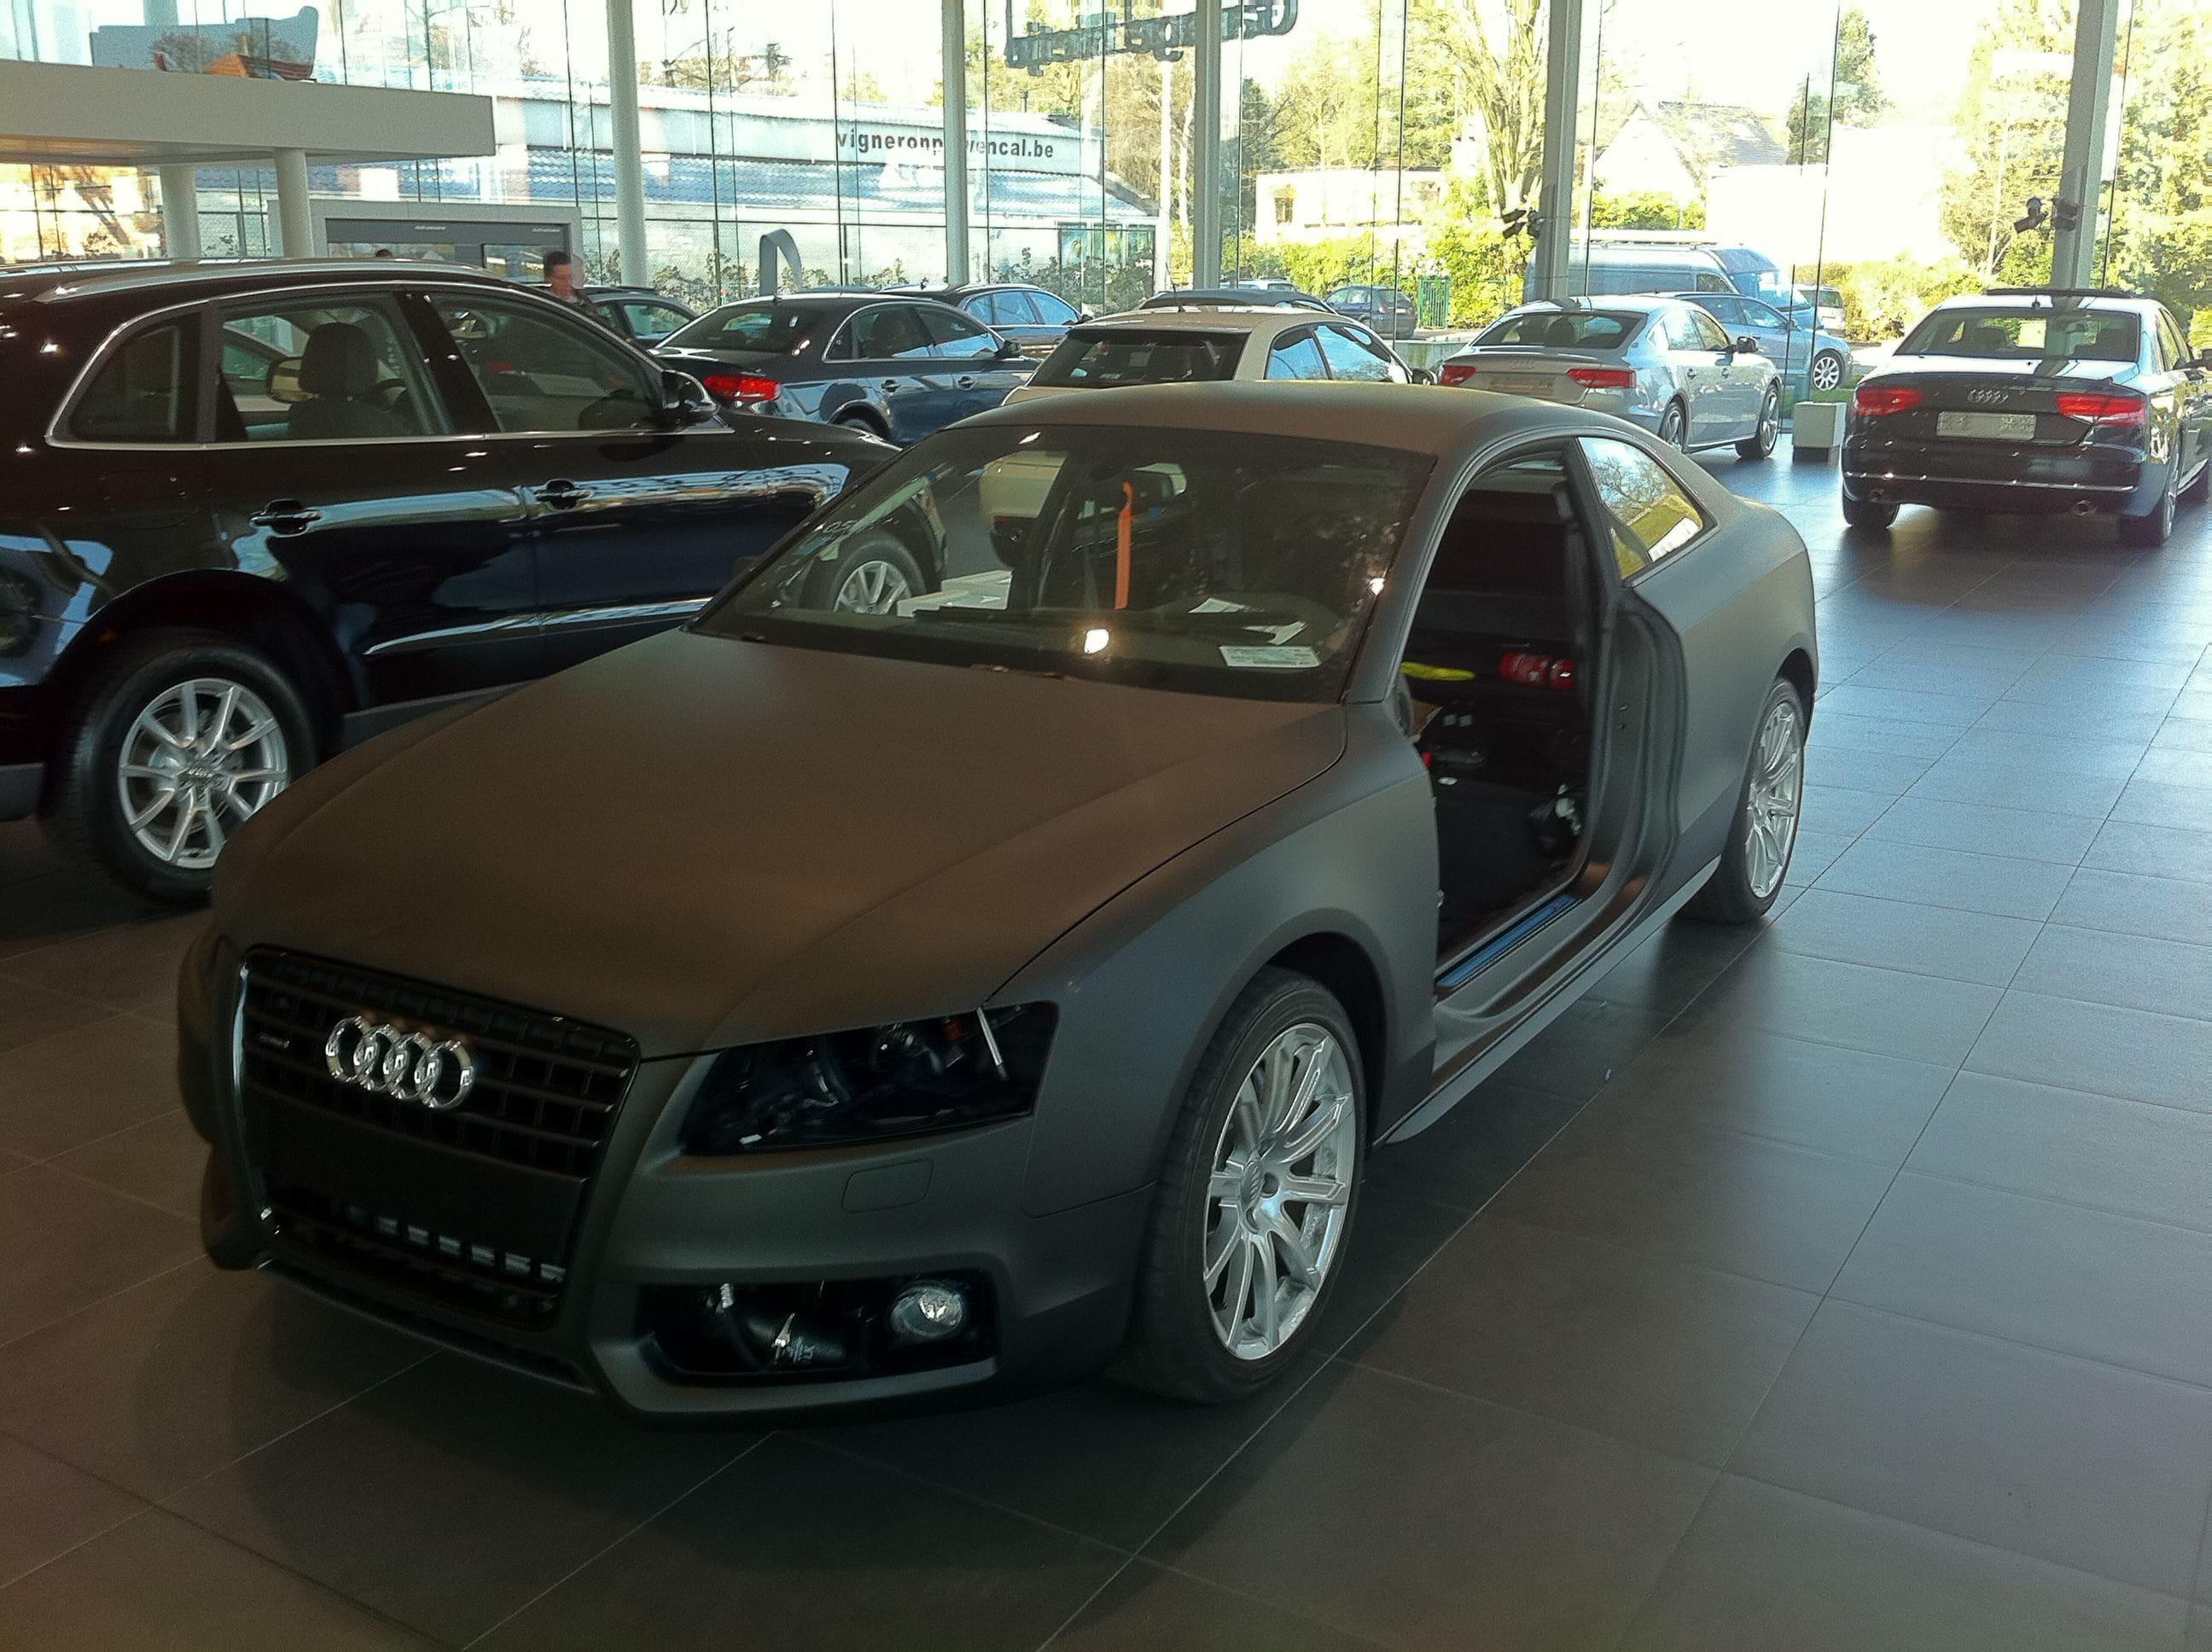 Audi A5 Coupe met Mat Zwarte Wrap, Carwrapping door Wrapmyride.nu Foto-nr:4586, ©2021